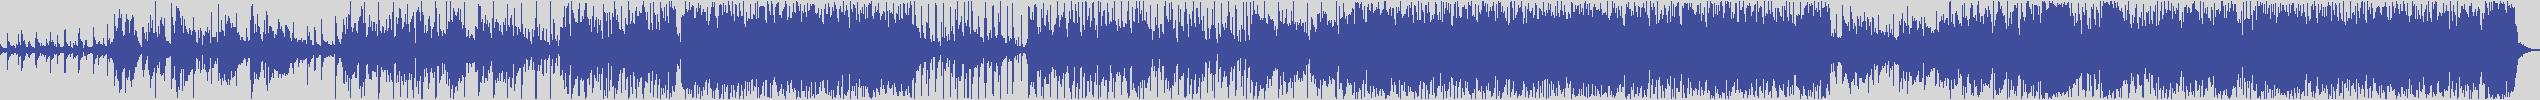 gold_hit_records [GHR005] Rodrigo Borda Zavaleta - Around the Corner [Radio Edit] audio wave form